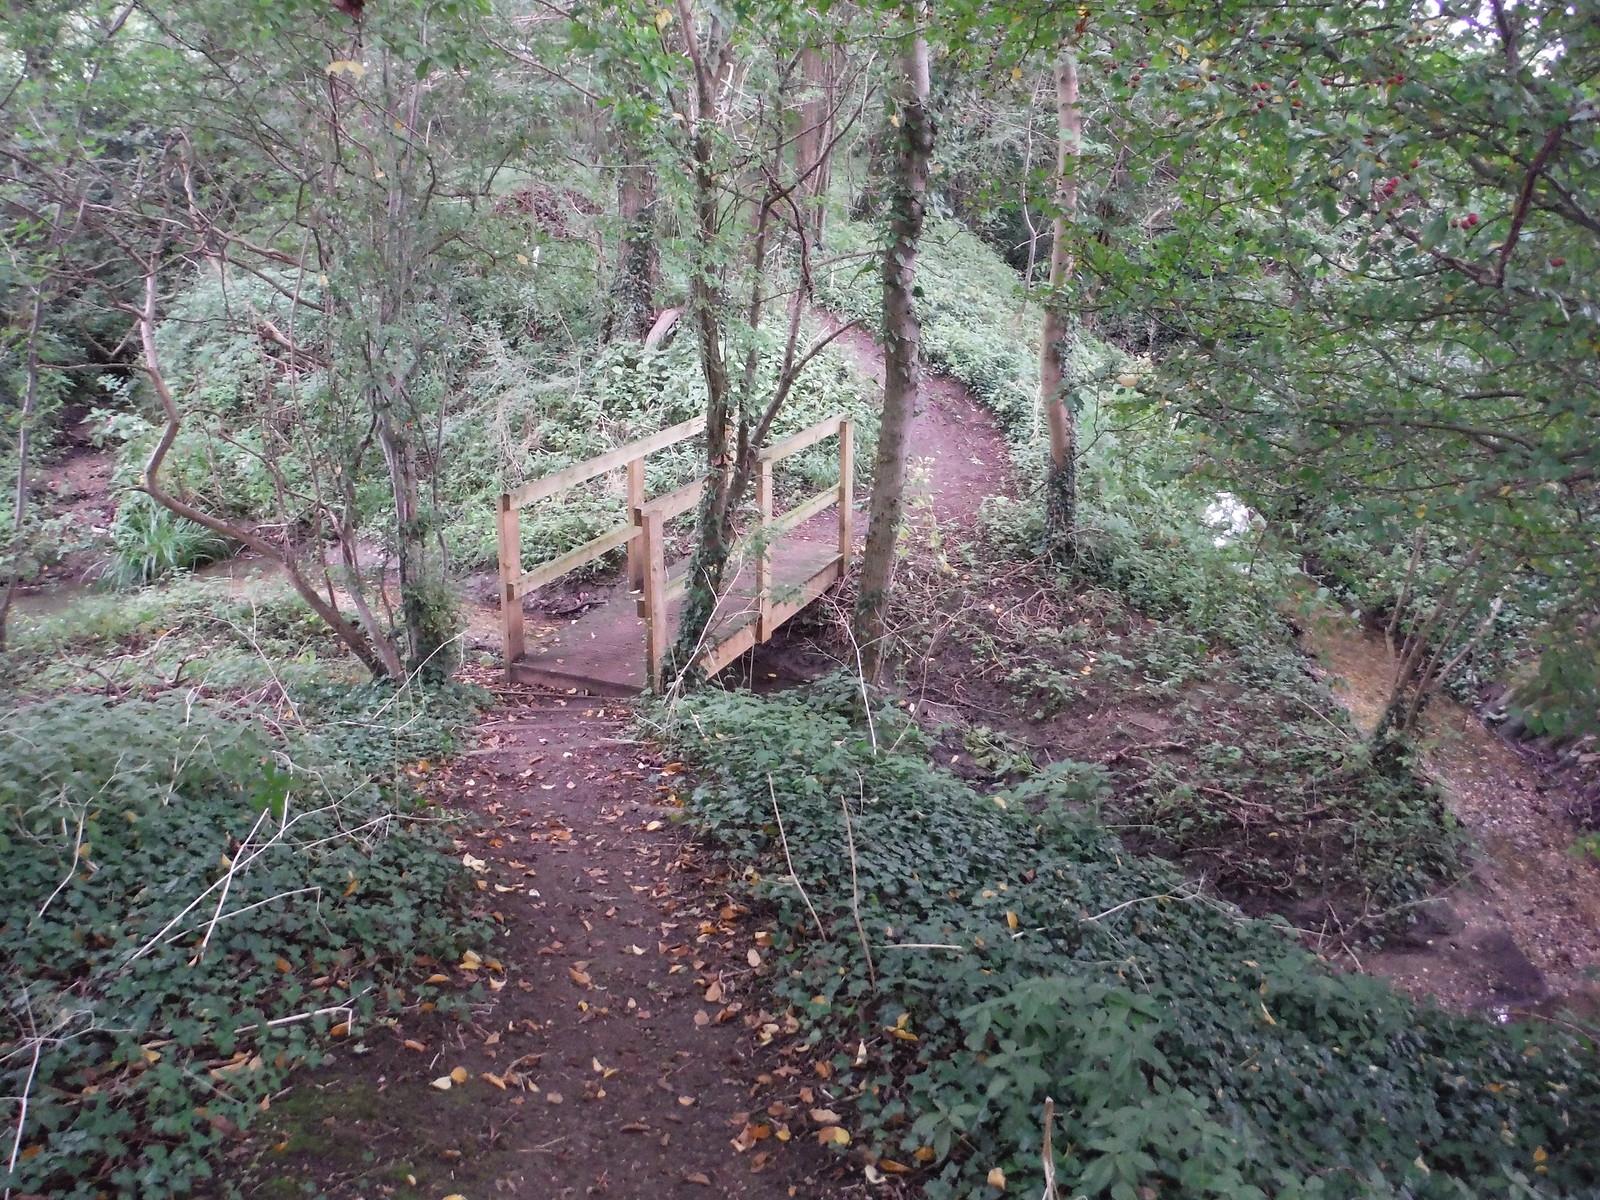 Path through wood in Henry Moore Foundation SWC Walk 164 Roydon to Sawbridgeworth via Henry Moore Foundation